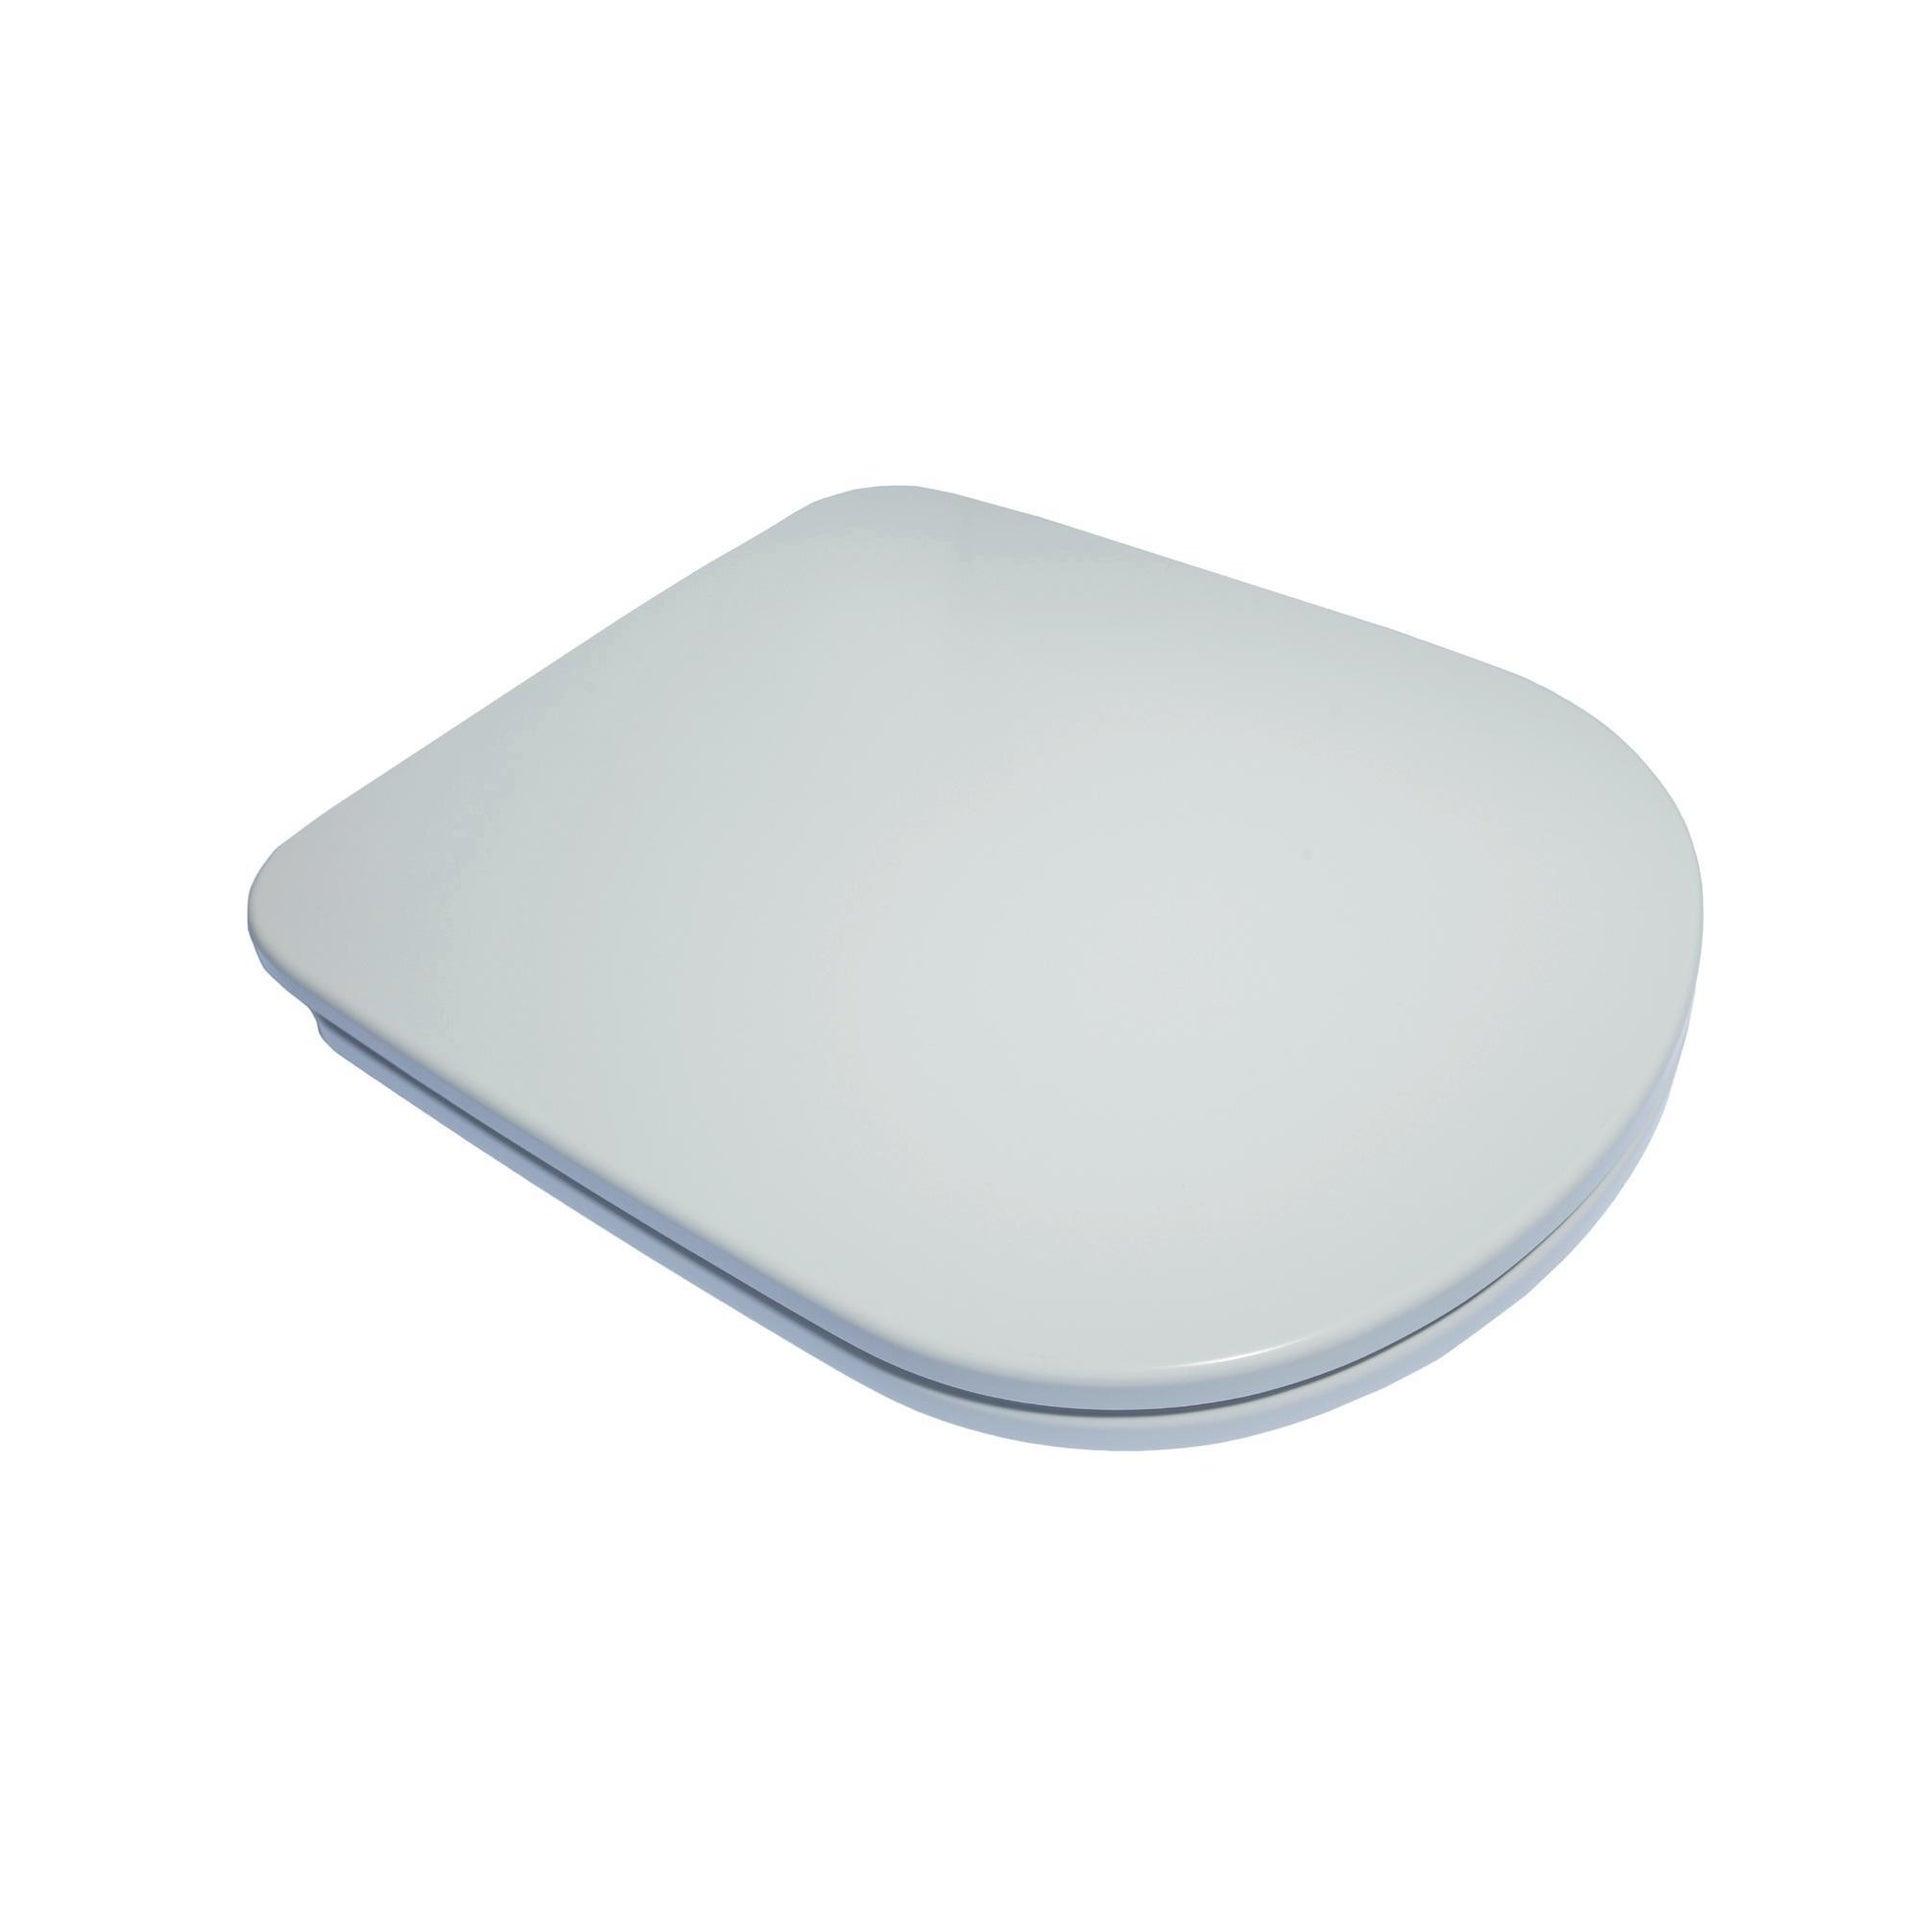 Copriwater ovale Originale per serie sanitari Gemma 2 IDEAL STANDARD termoindurente bianco - 6